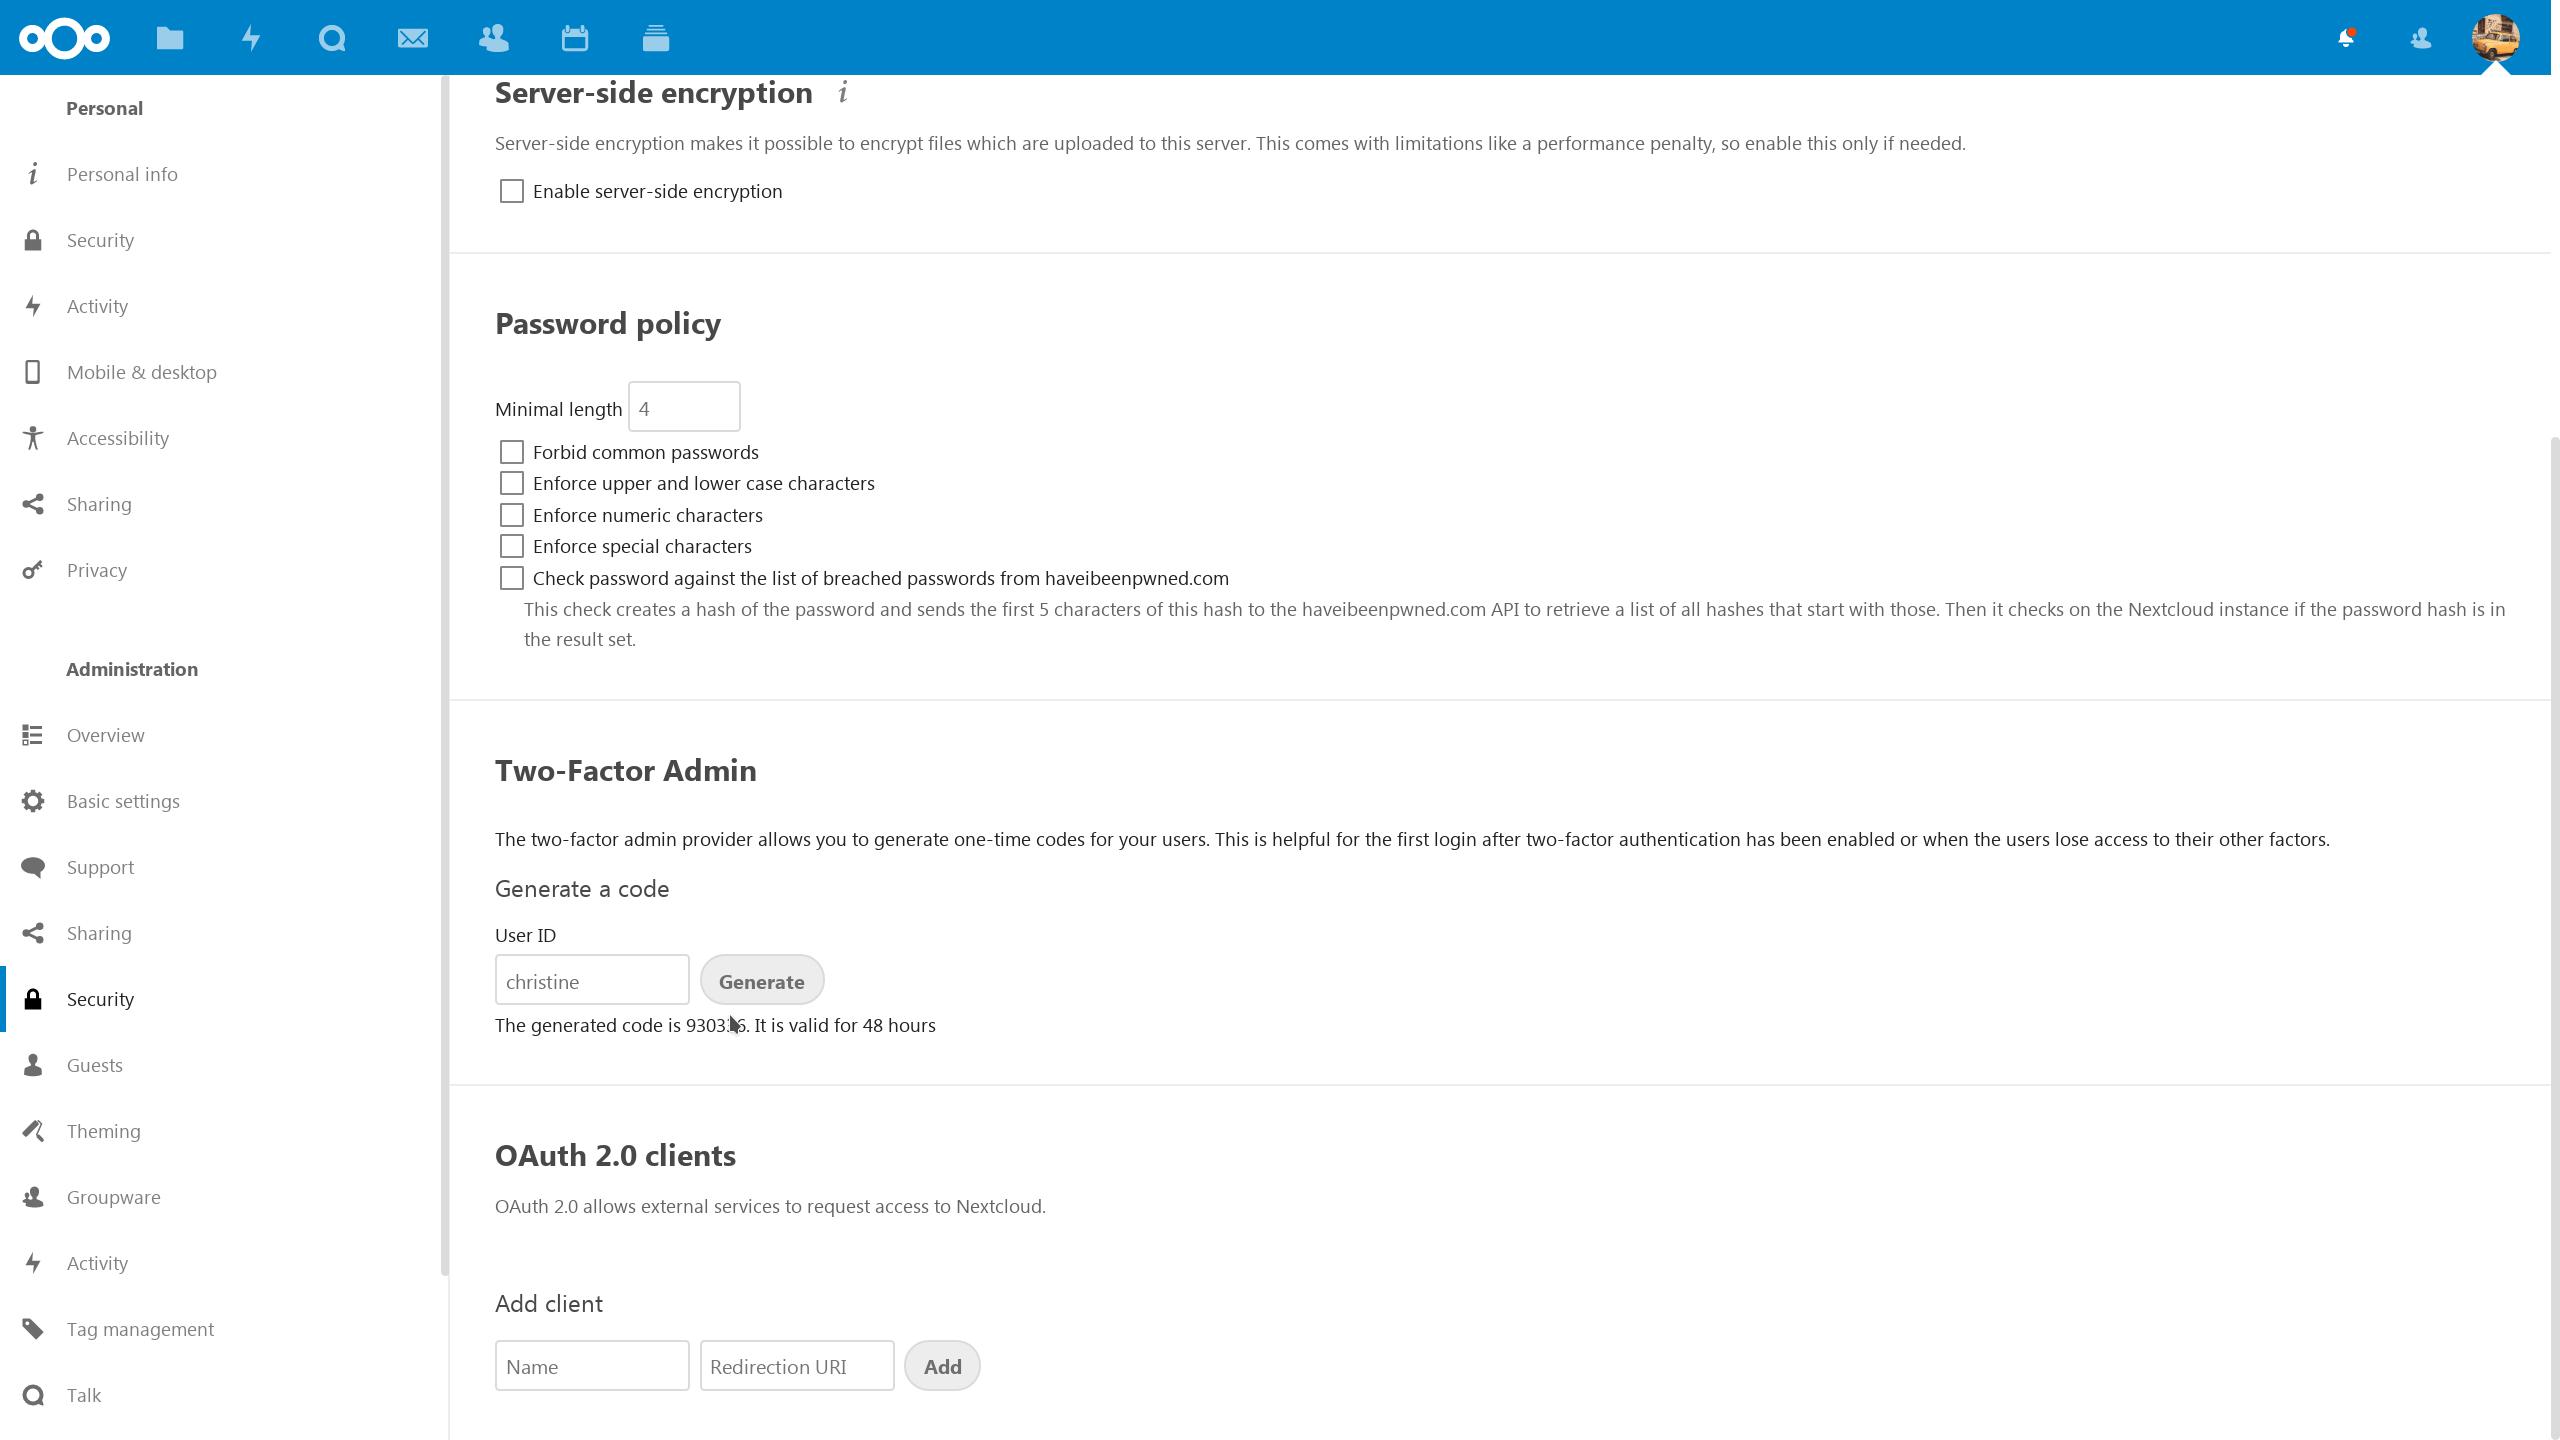 One-time login token creation